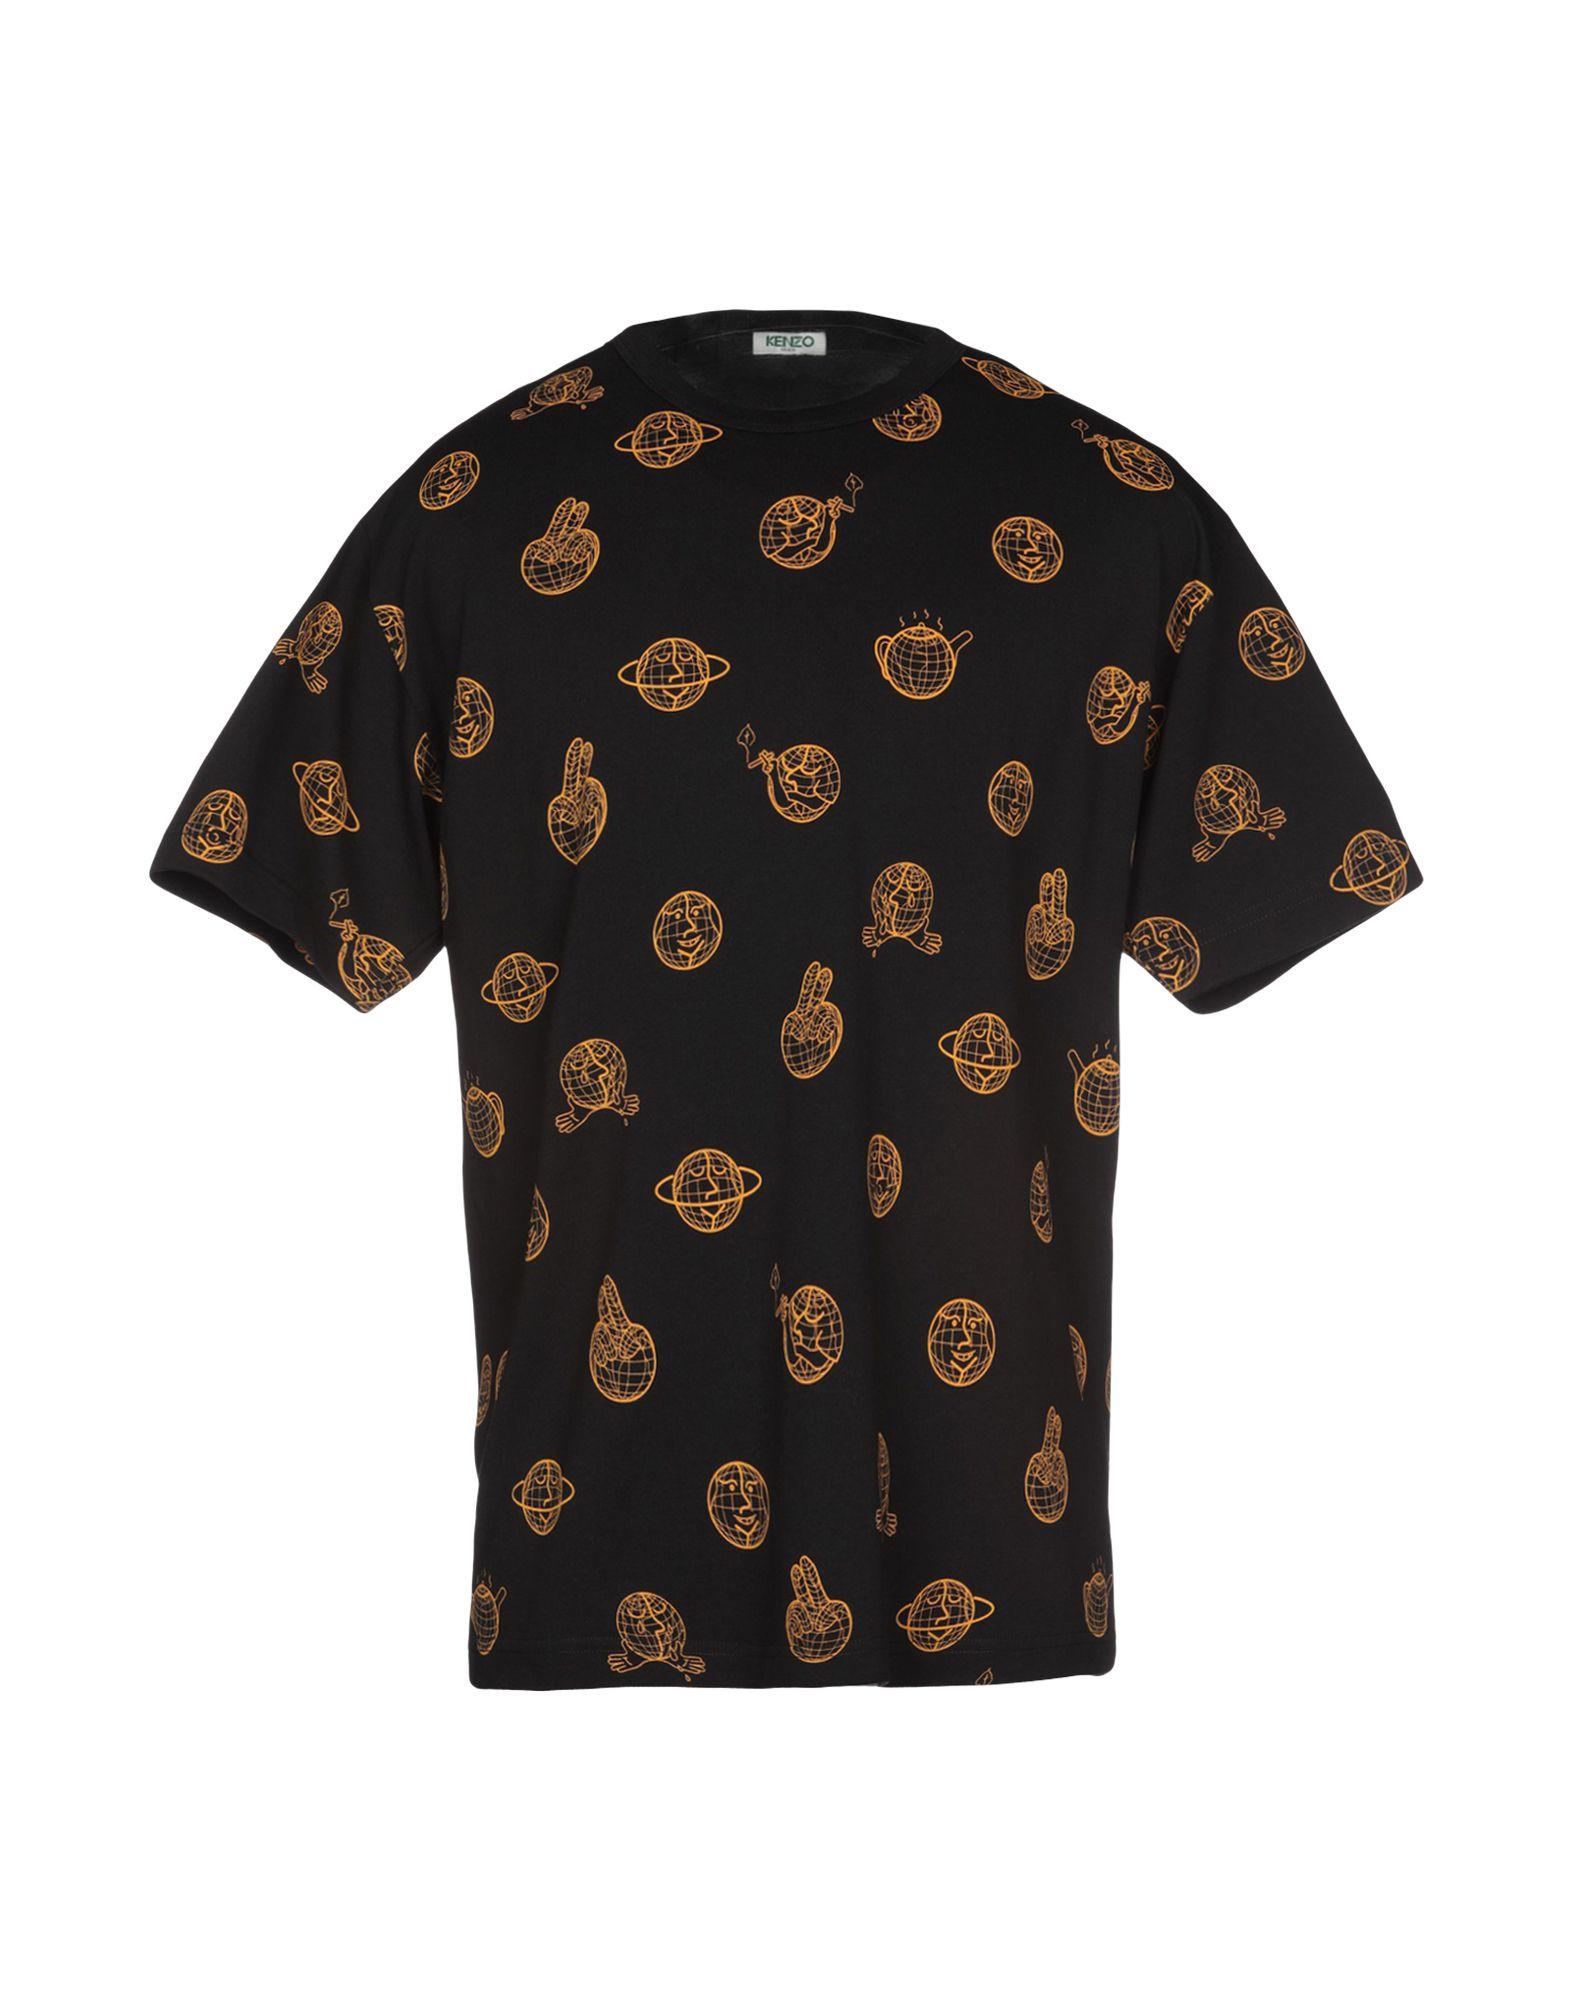 7ae0c5c7 Kenzo T-Shirt - Men Kenzo T-Shirts online on YOOX United States - 12225755